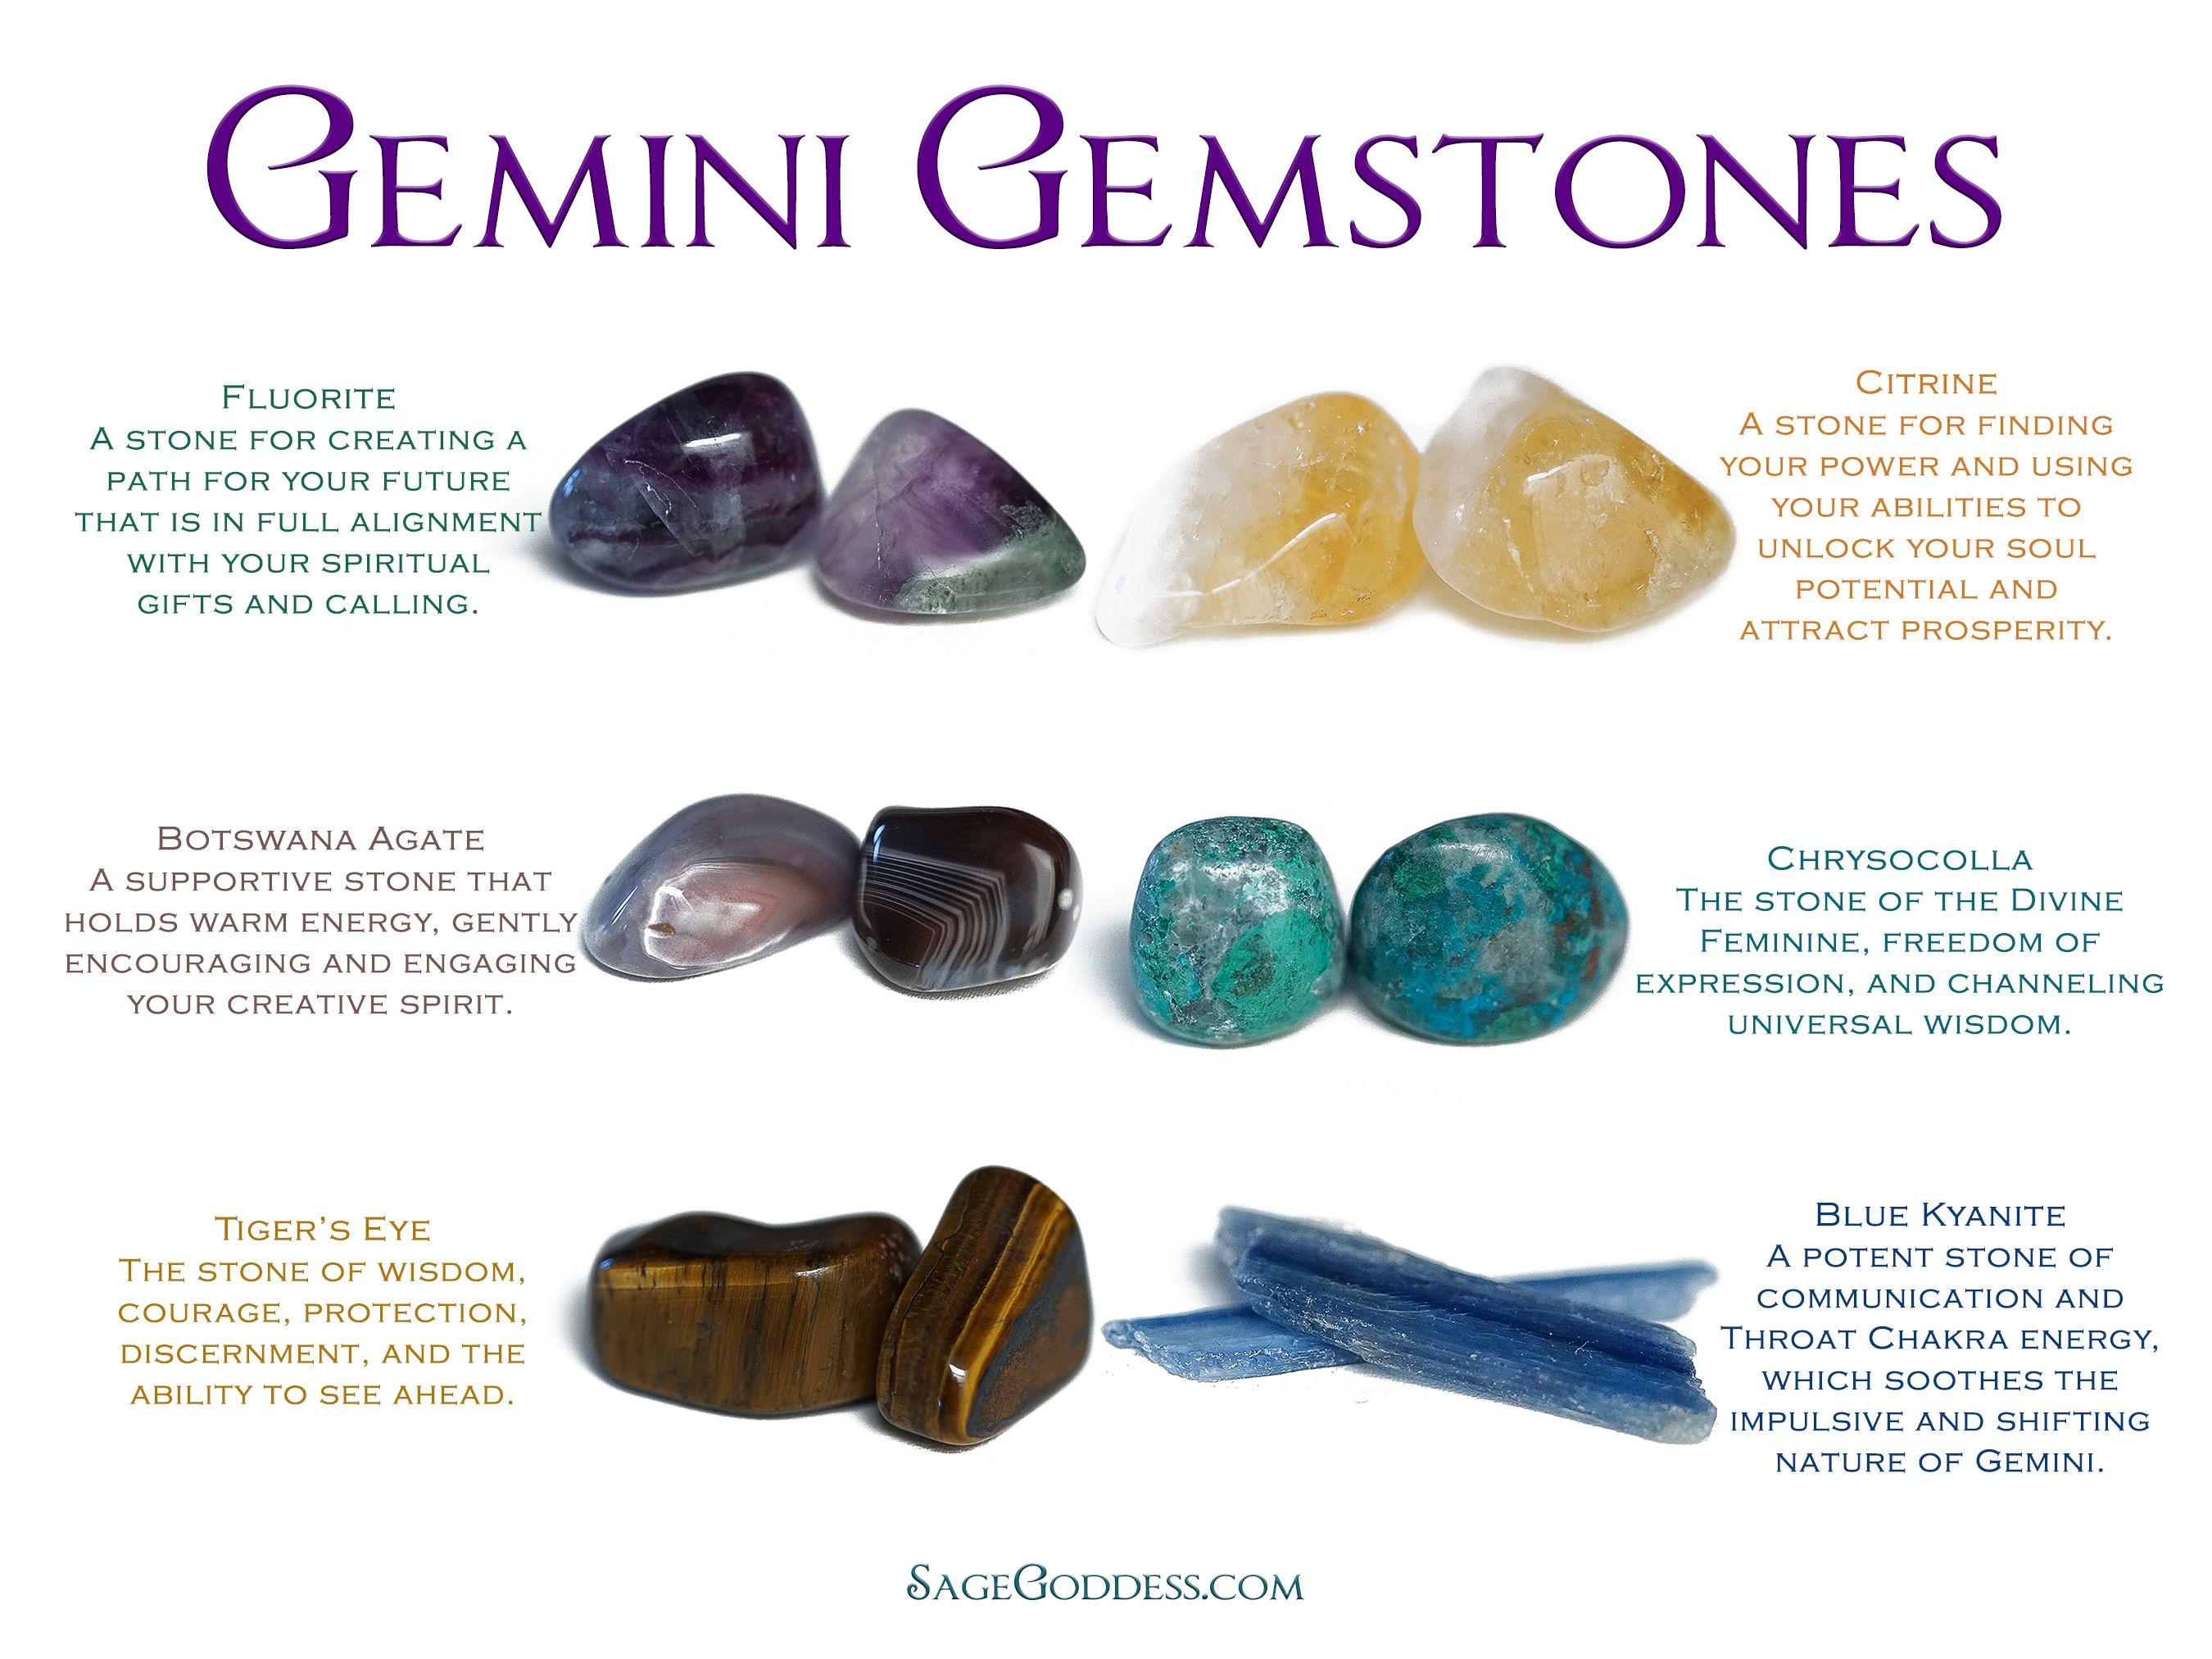 gemini gemstones fluorite botswana agate tiger s eye